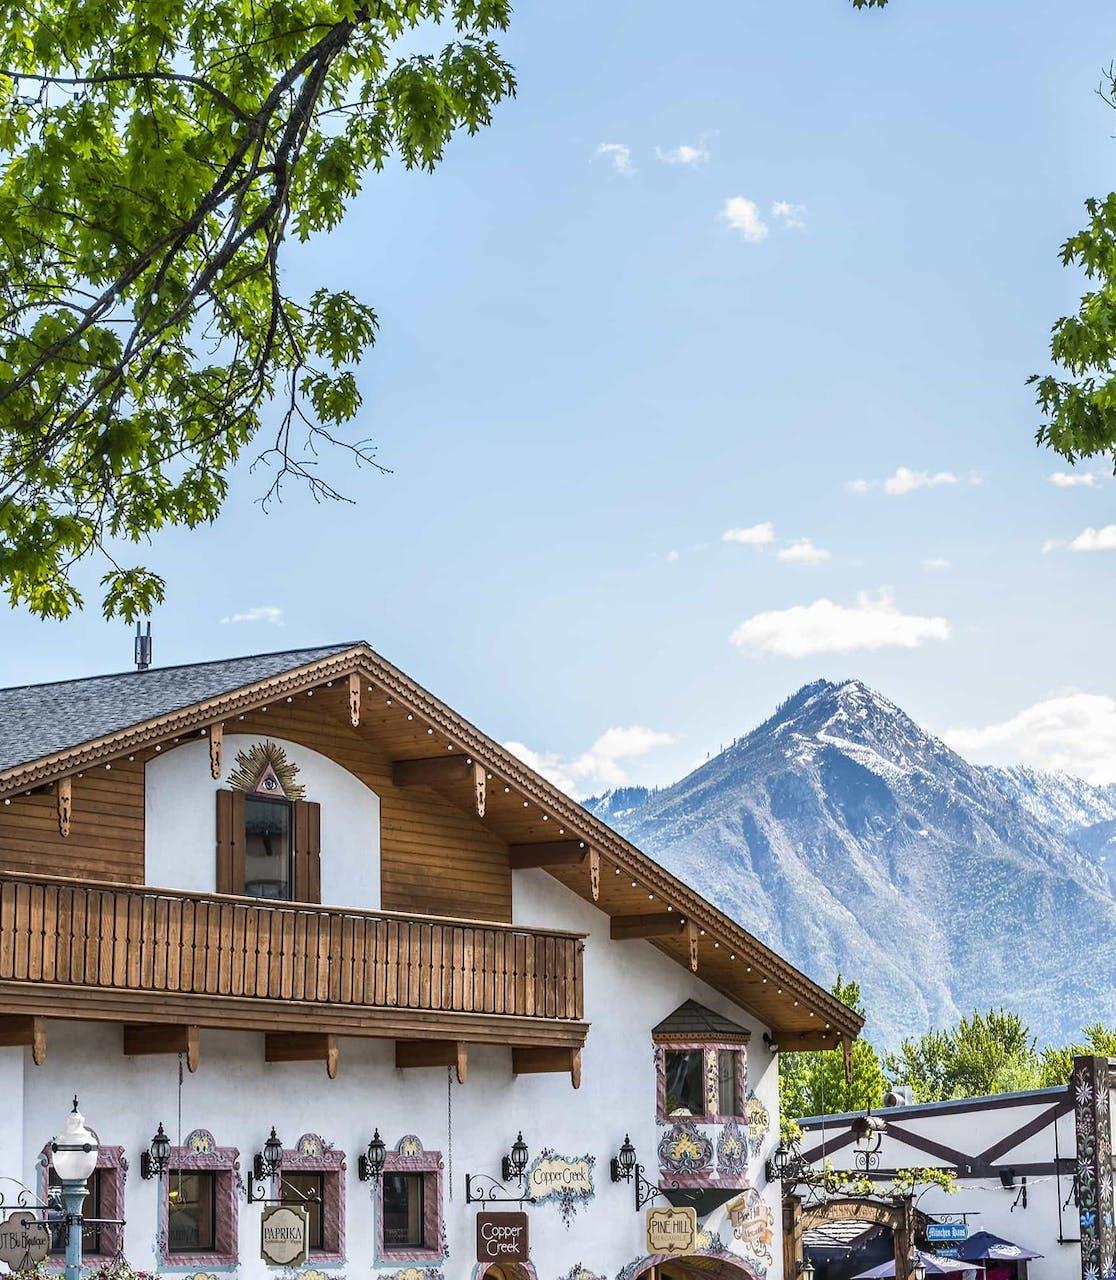 Leavenworth's Bavarian architecture